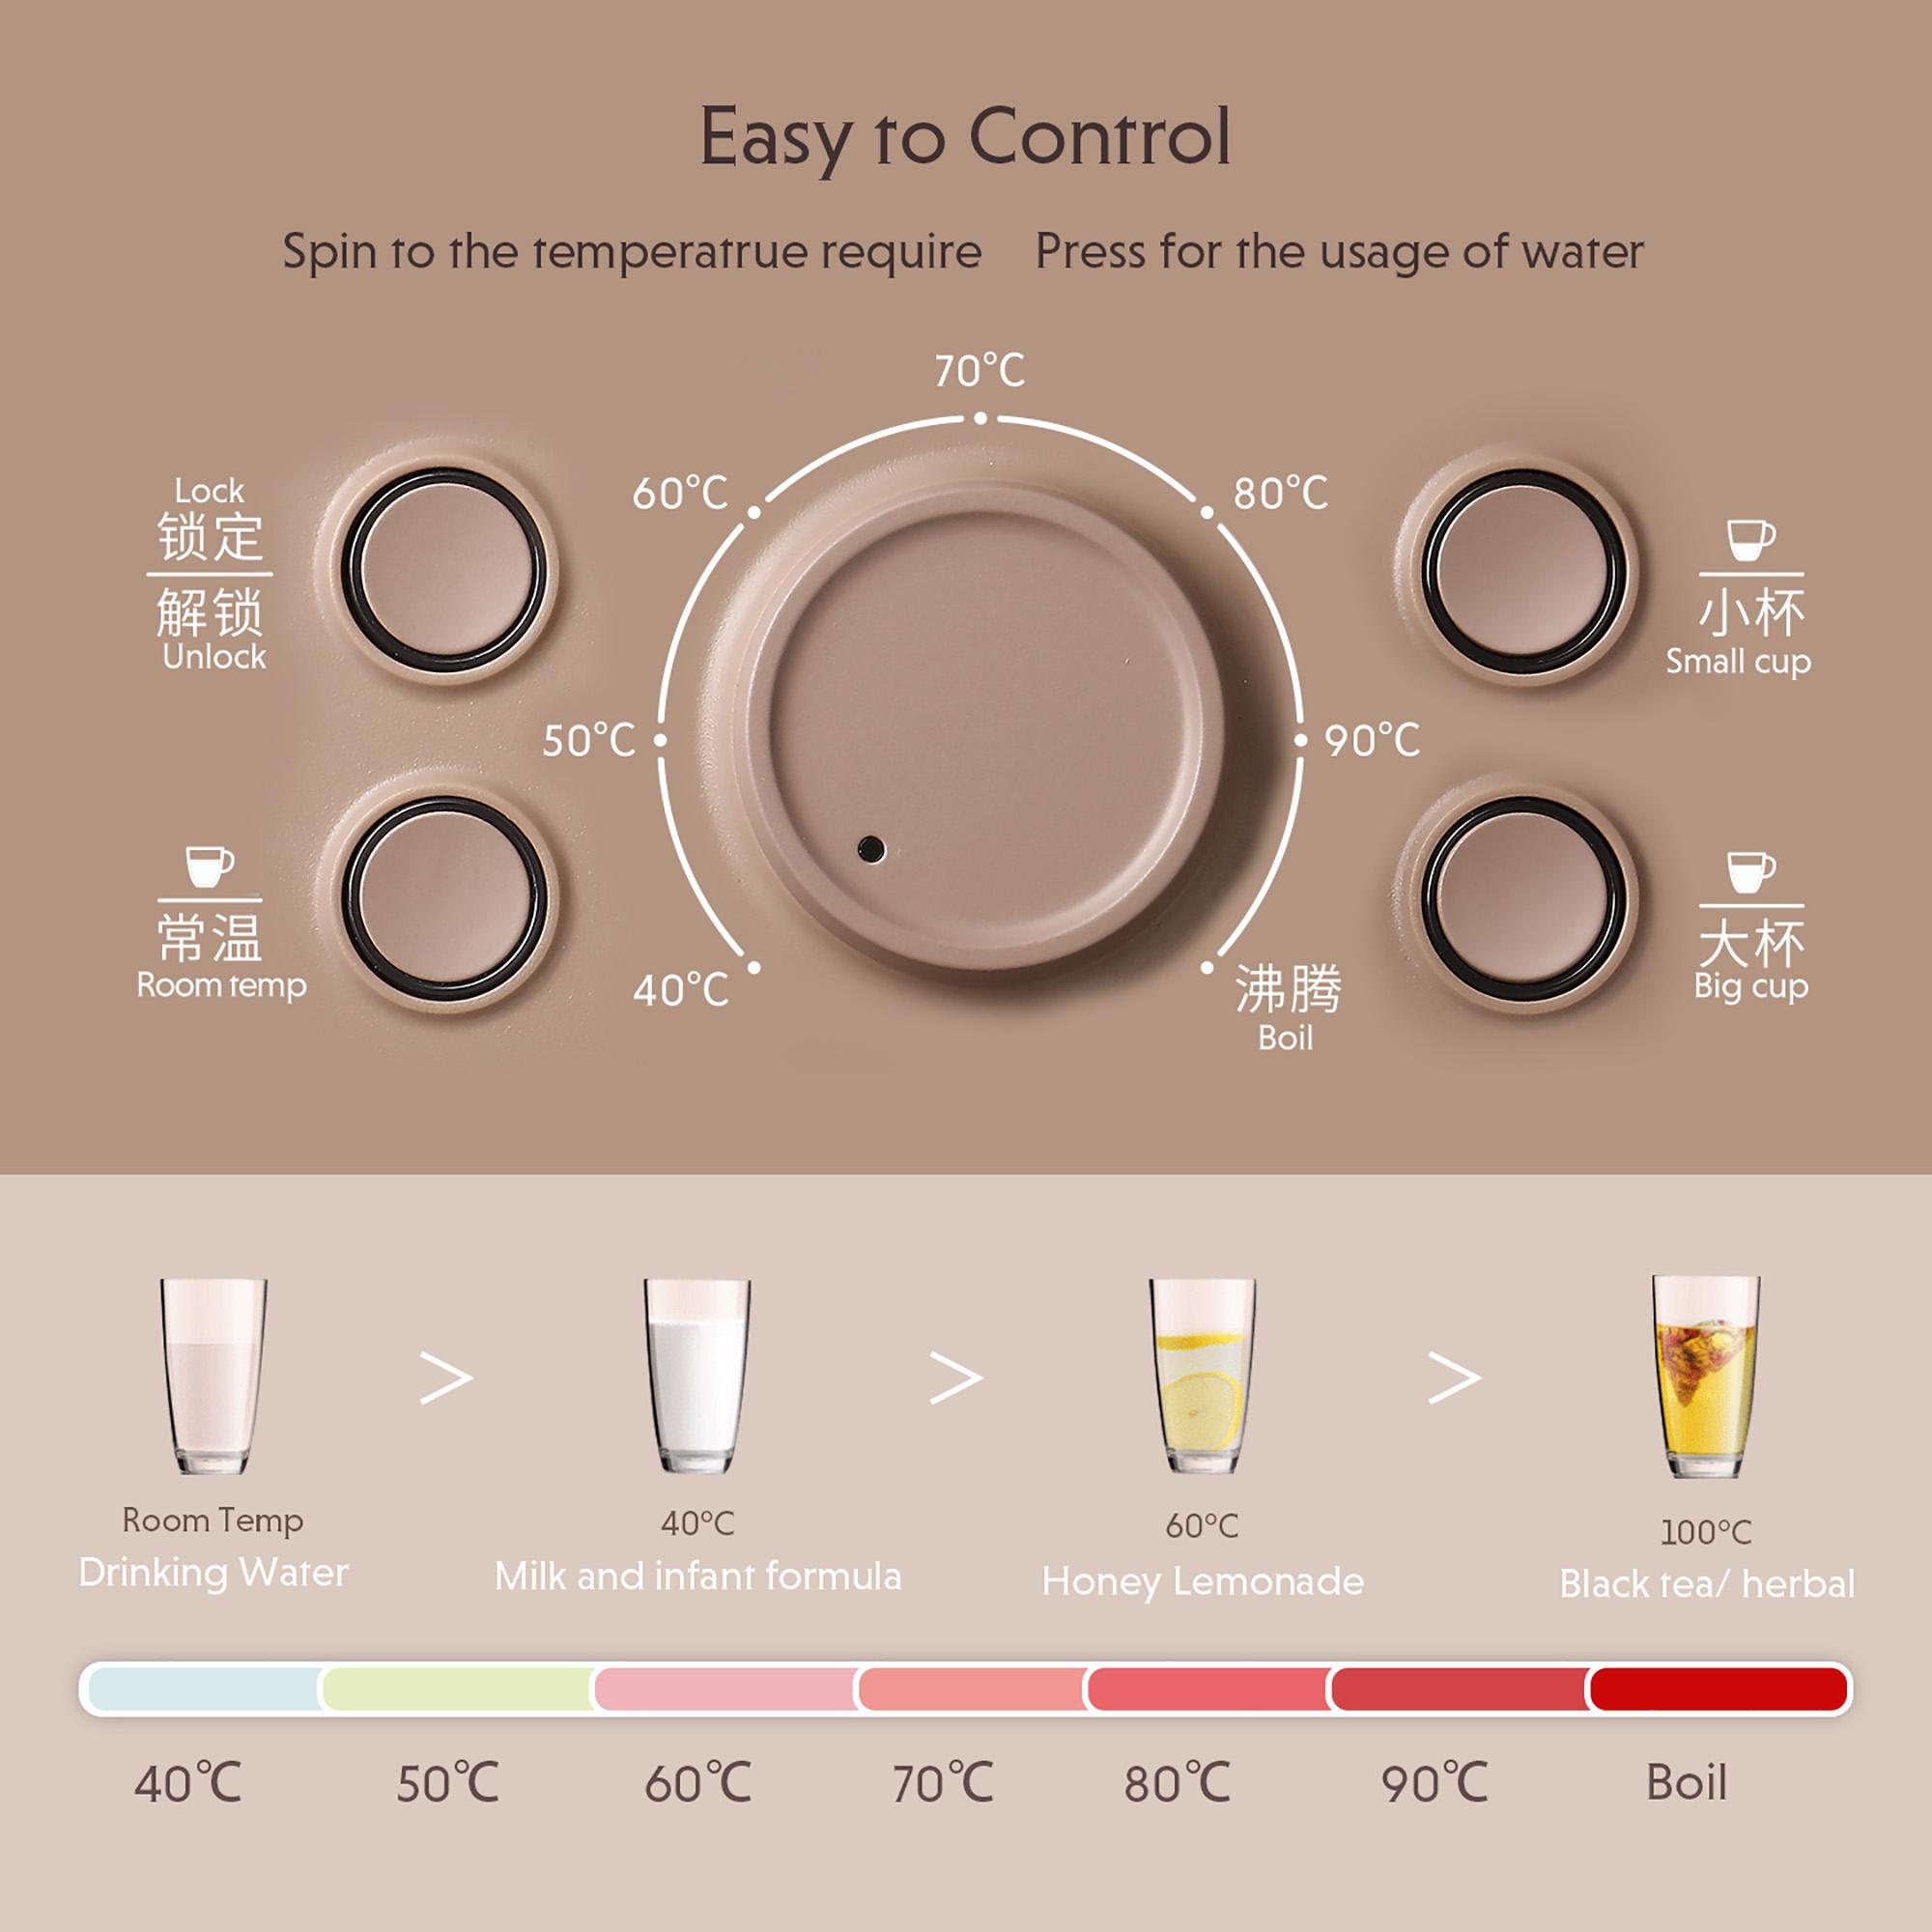 [US Direct] Original BUYDEEM S7133 Hot Water Boiler and Warmer, Fresh, Instant, Adjustable Temperatures (2.6L, Light Pink) Light Pink